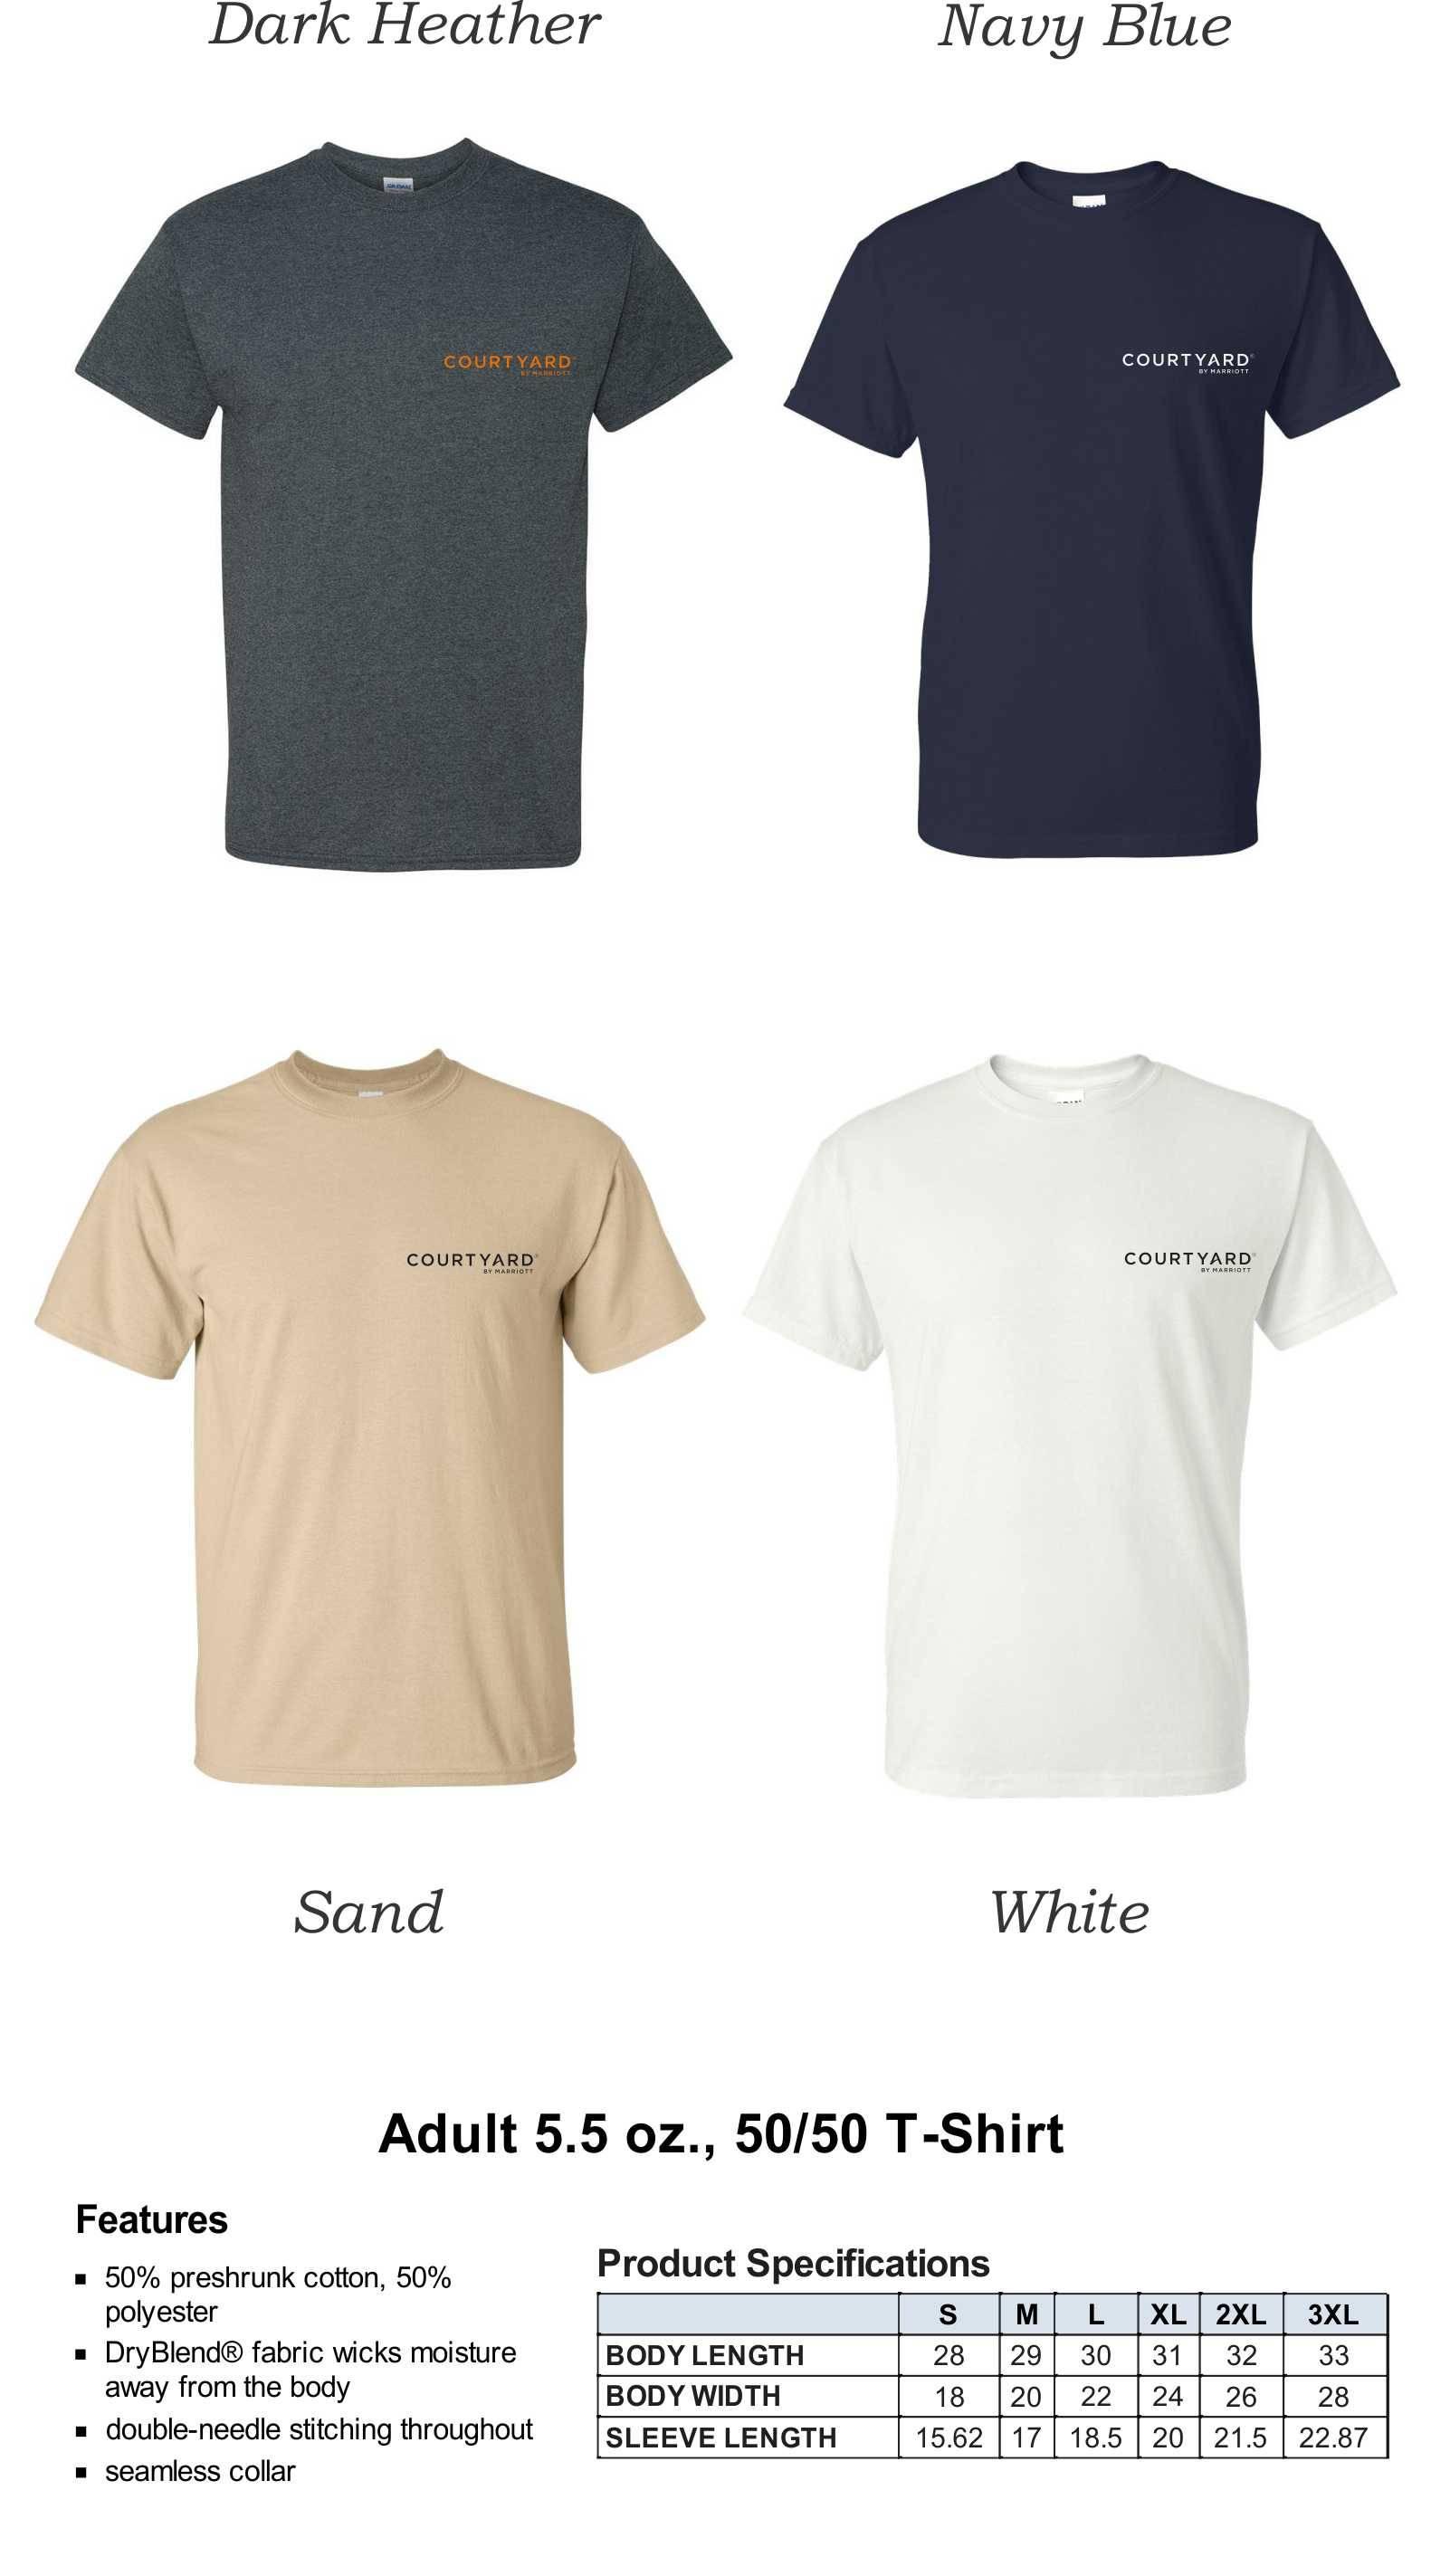 T-Shirts, HeavyWeight 50/50 |  DryBlend Fabric | Silk-Screen Logo